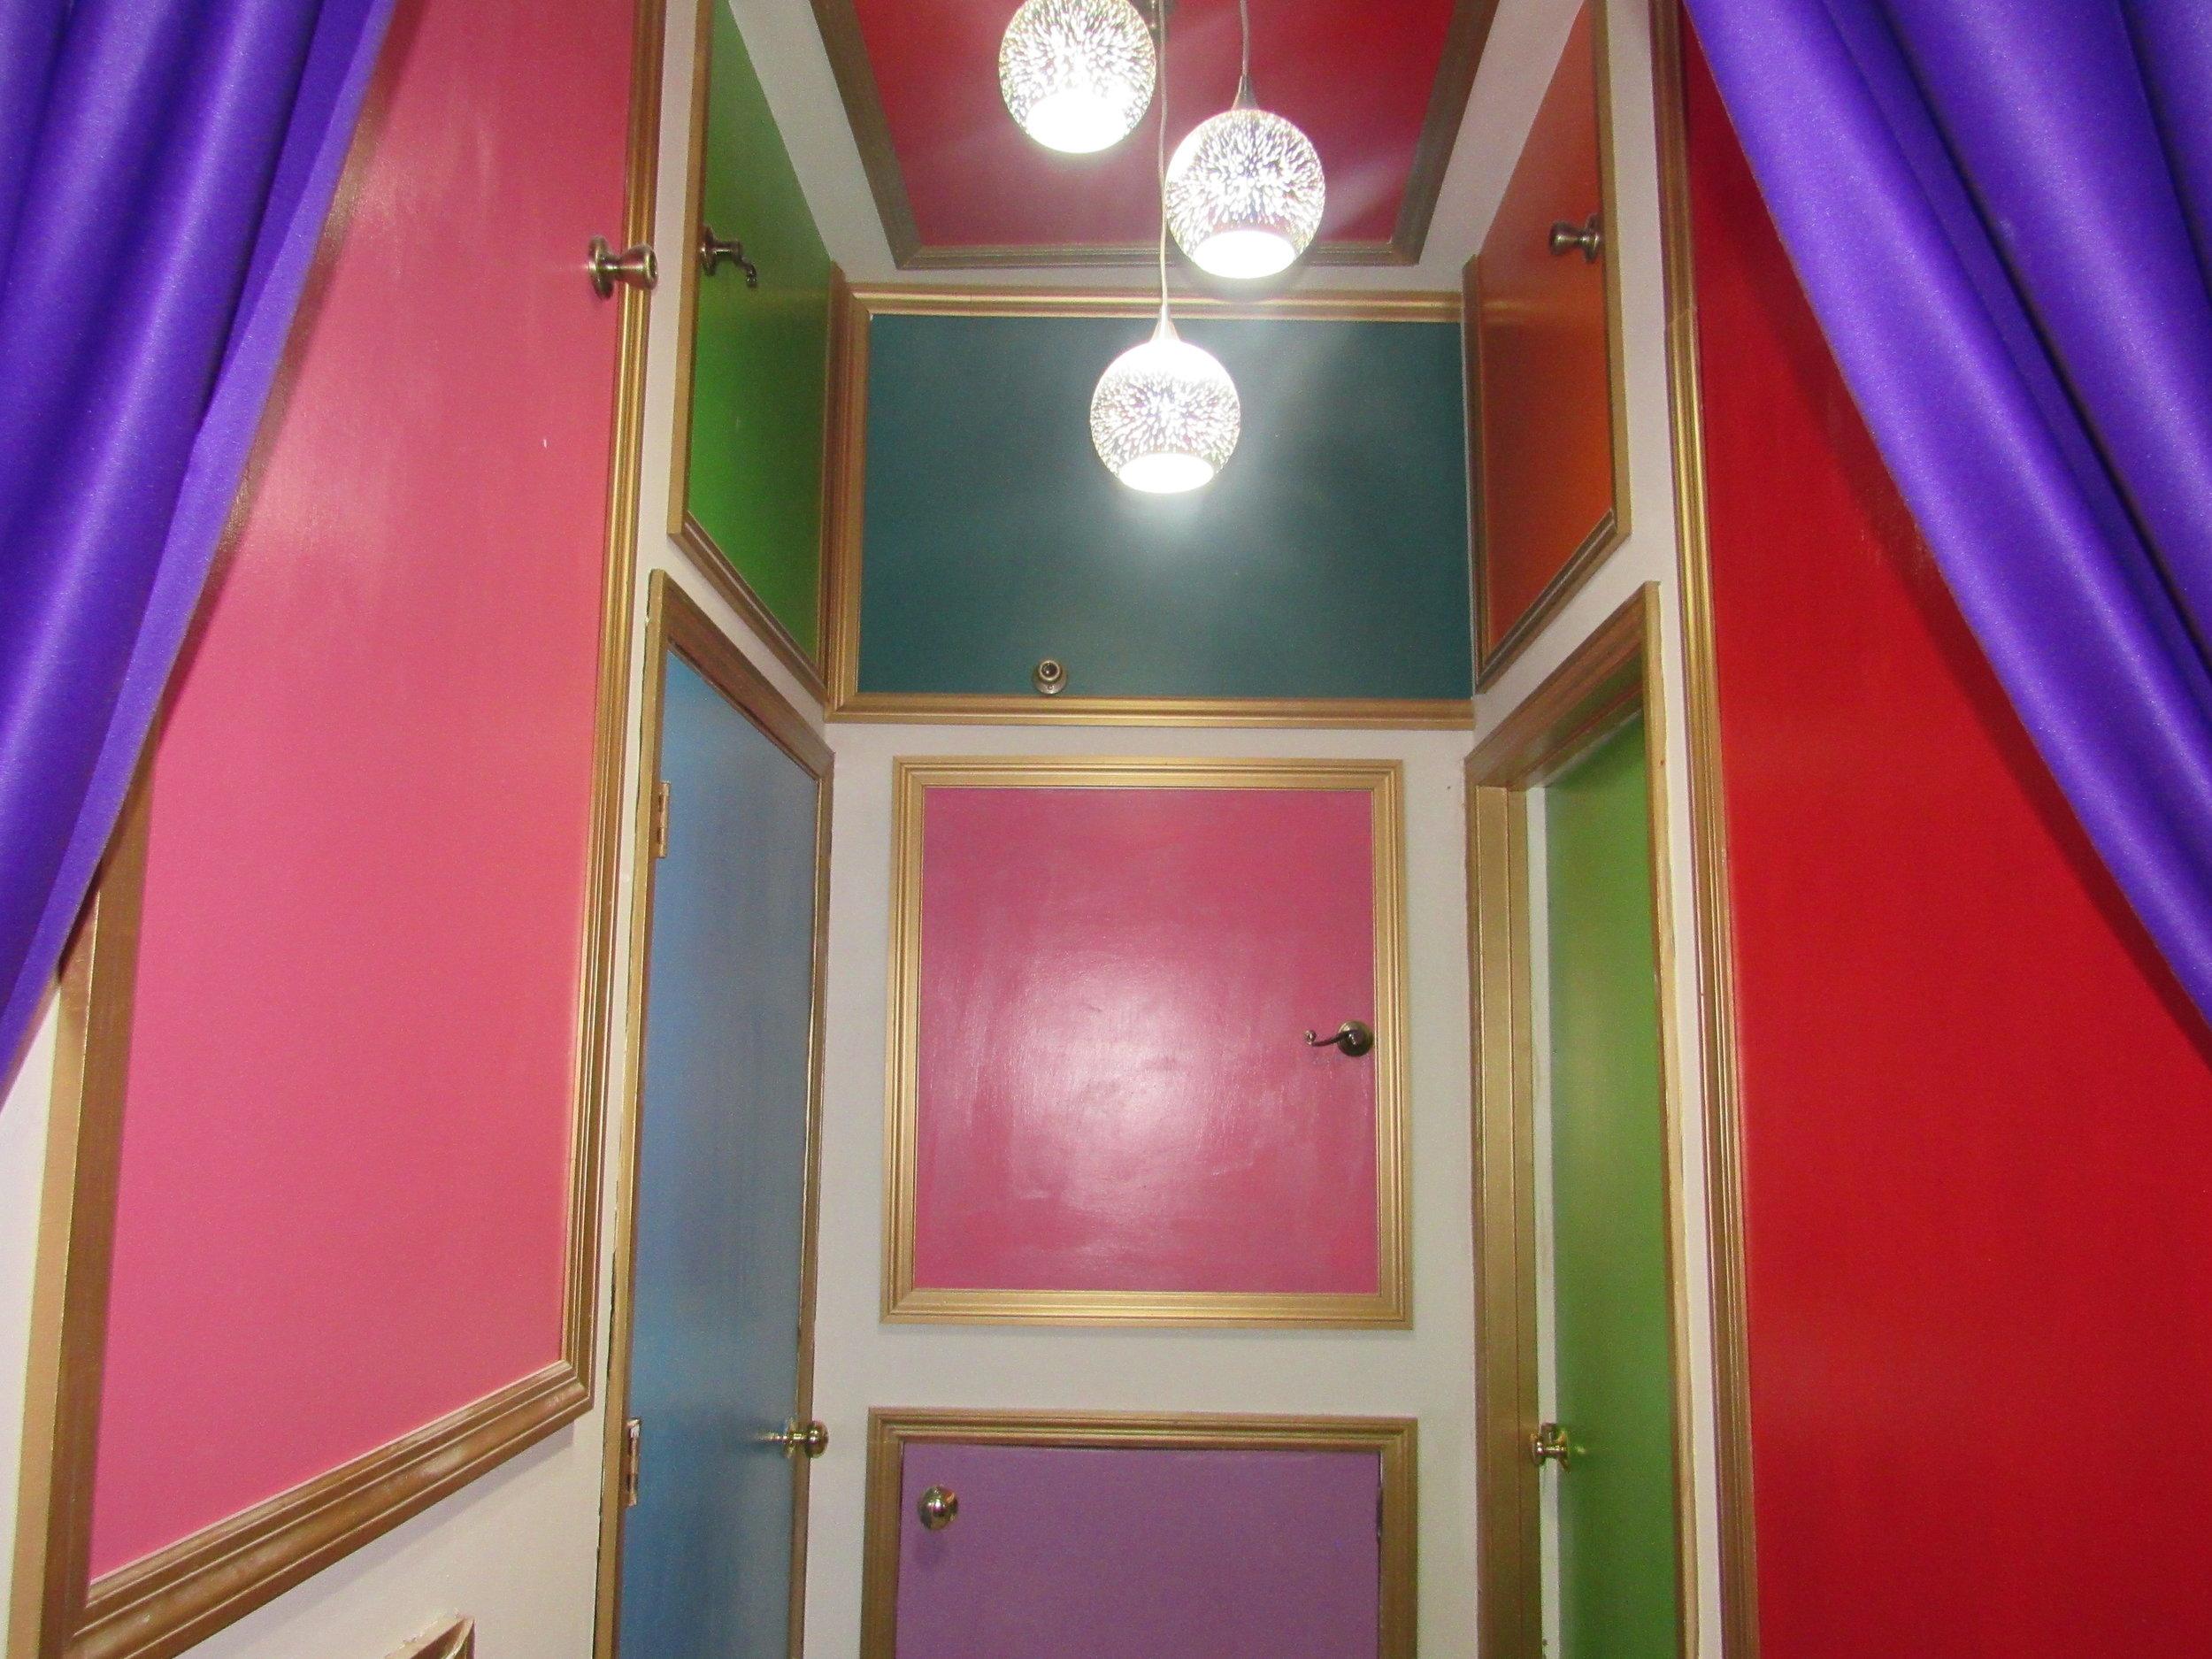 the-final-door-escape-room-columbia-sc-down-the-rabbit-hole.JPG